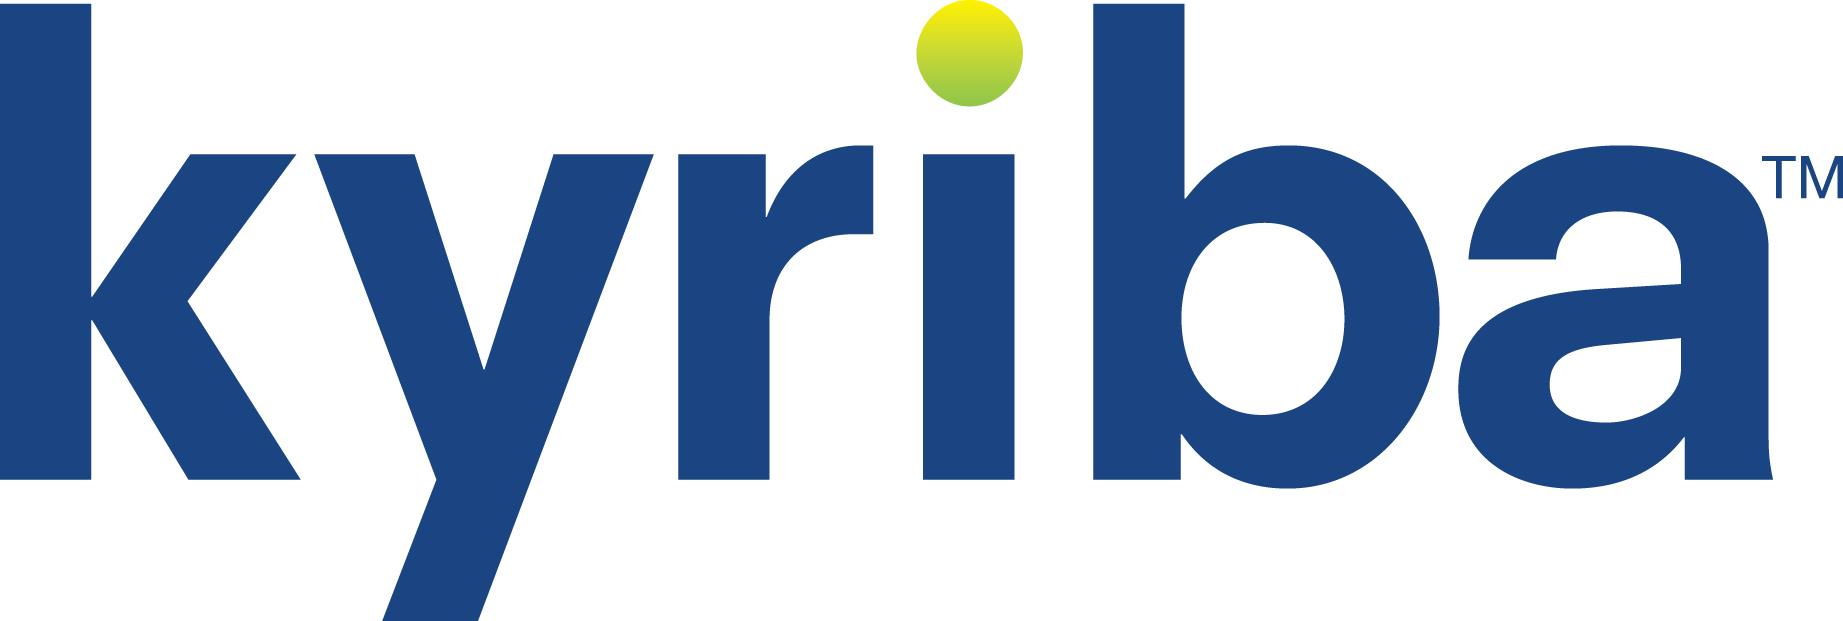 Kyriba Named the World's Best Cash Forecasting Solution